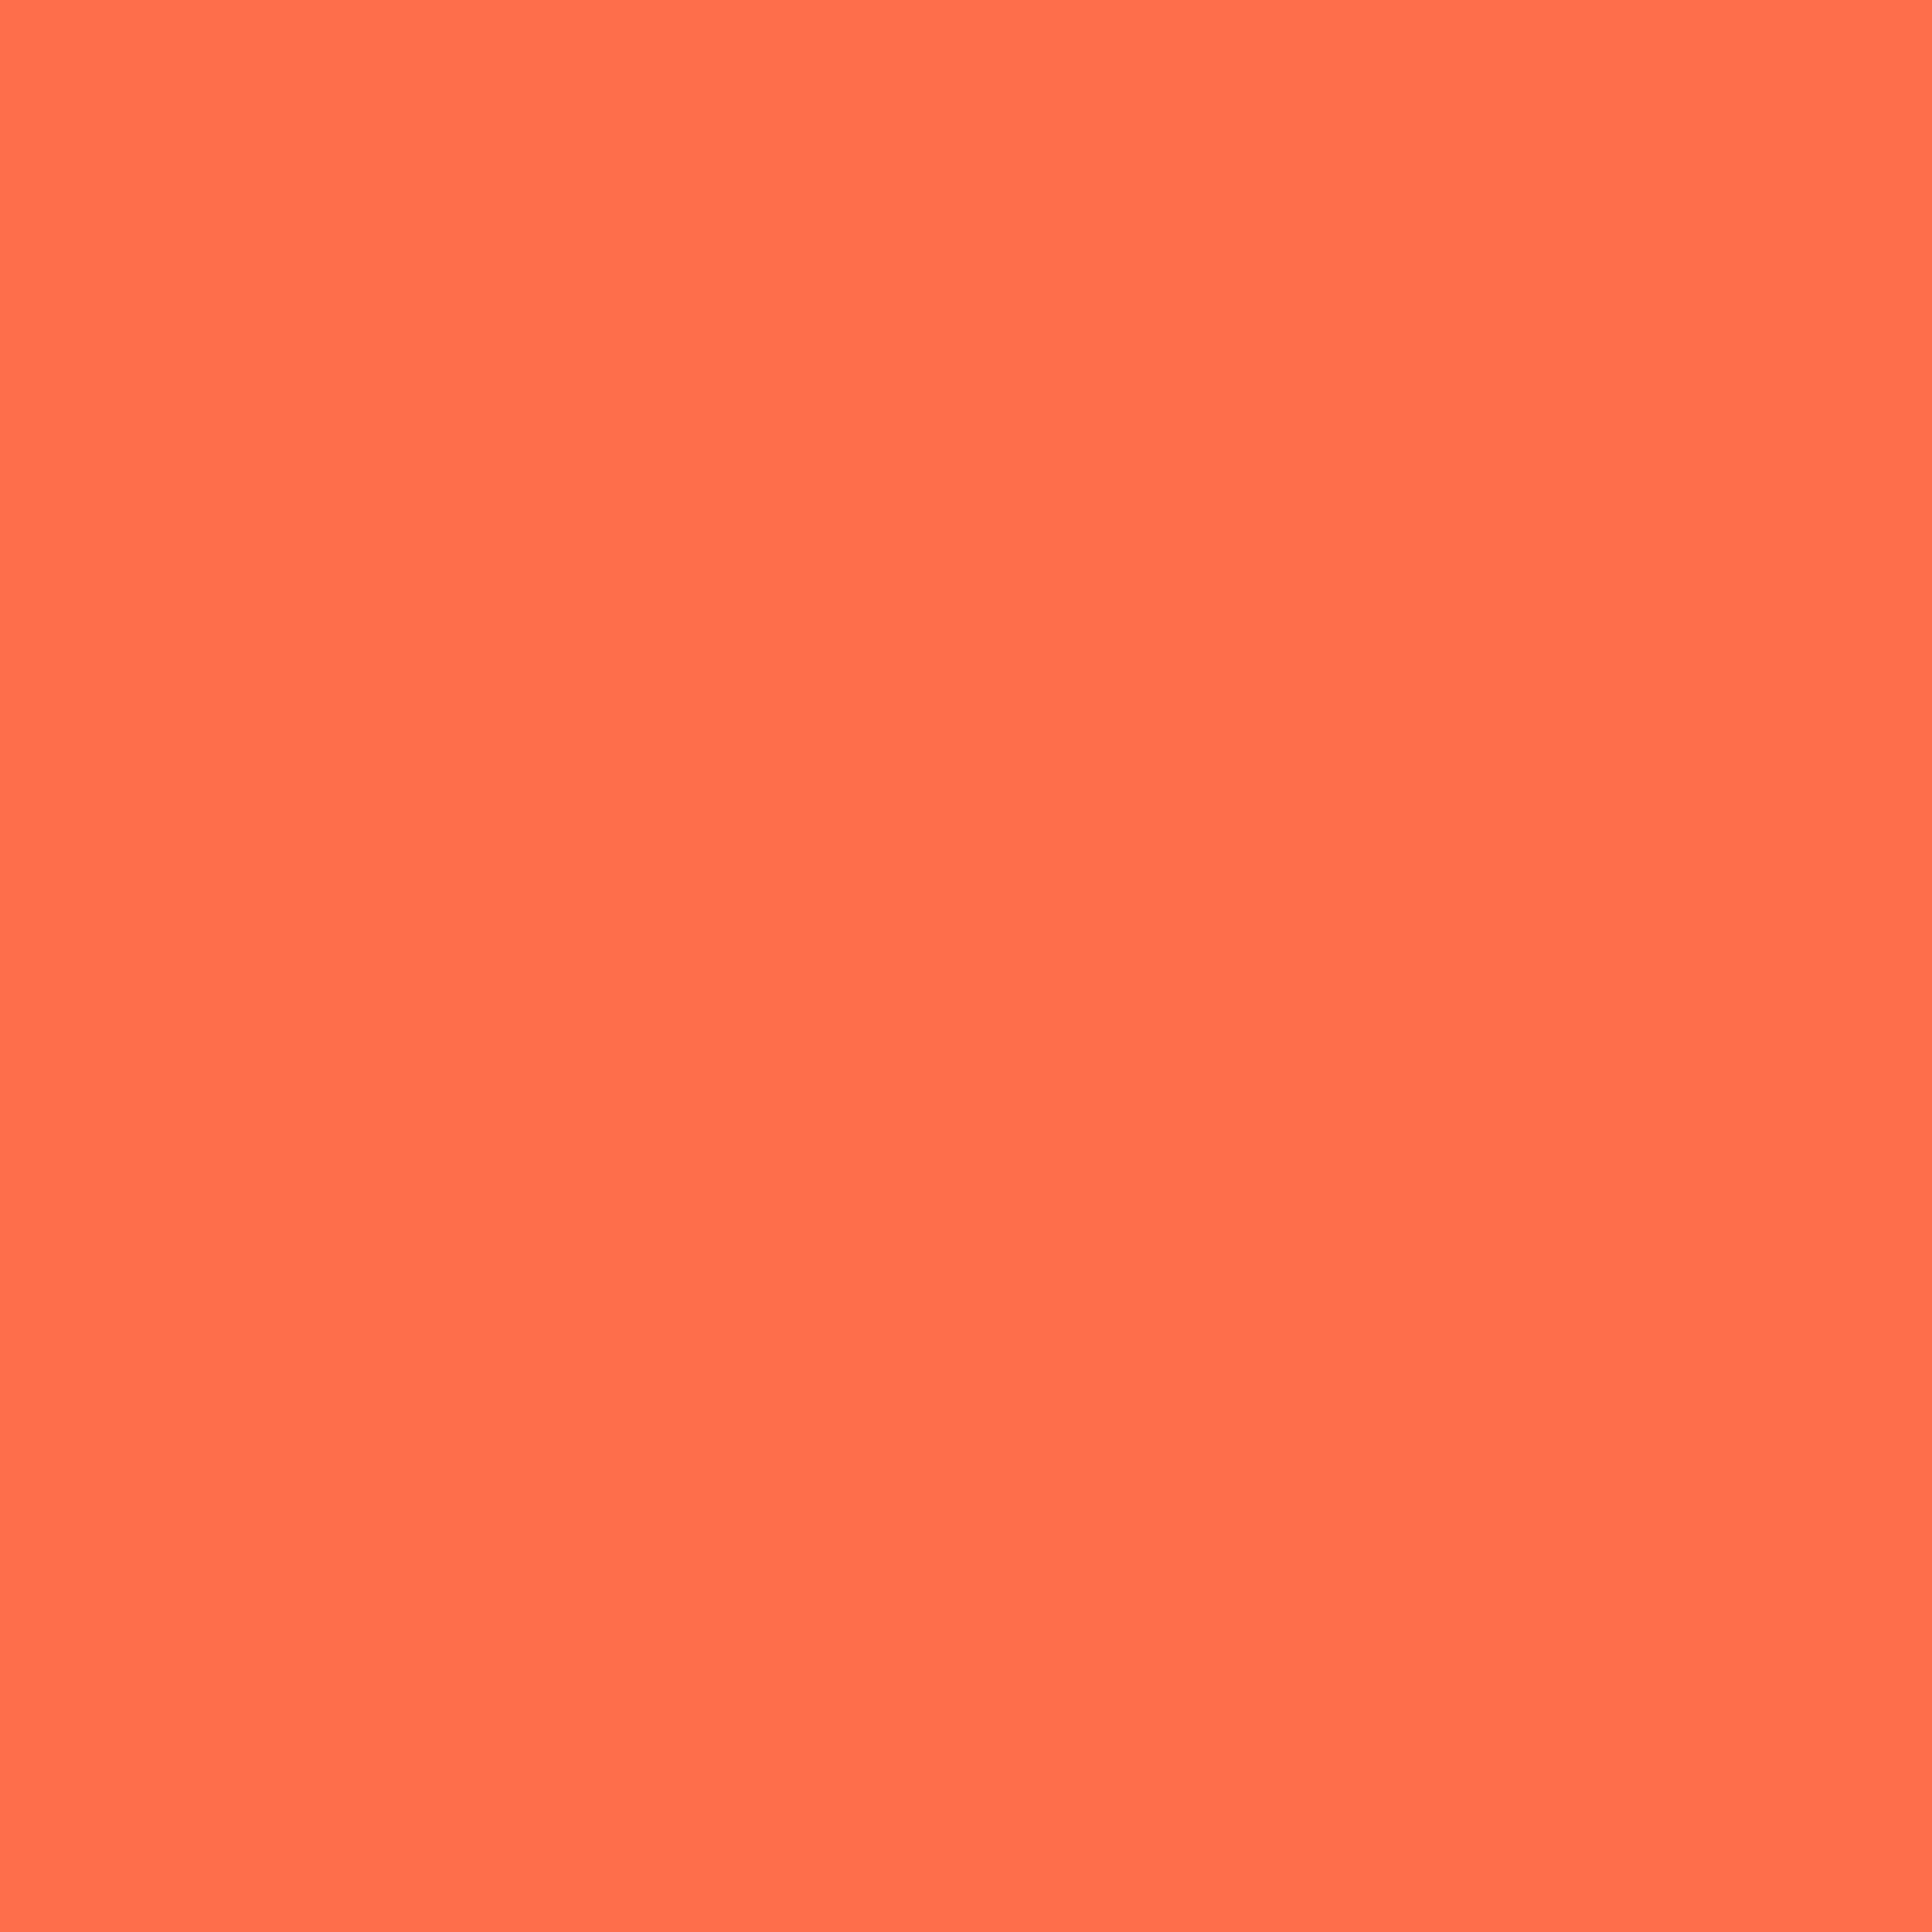 3600x3600 Outrageous Orange Solid Color Background